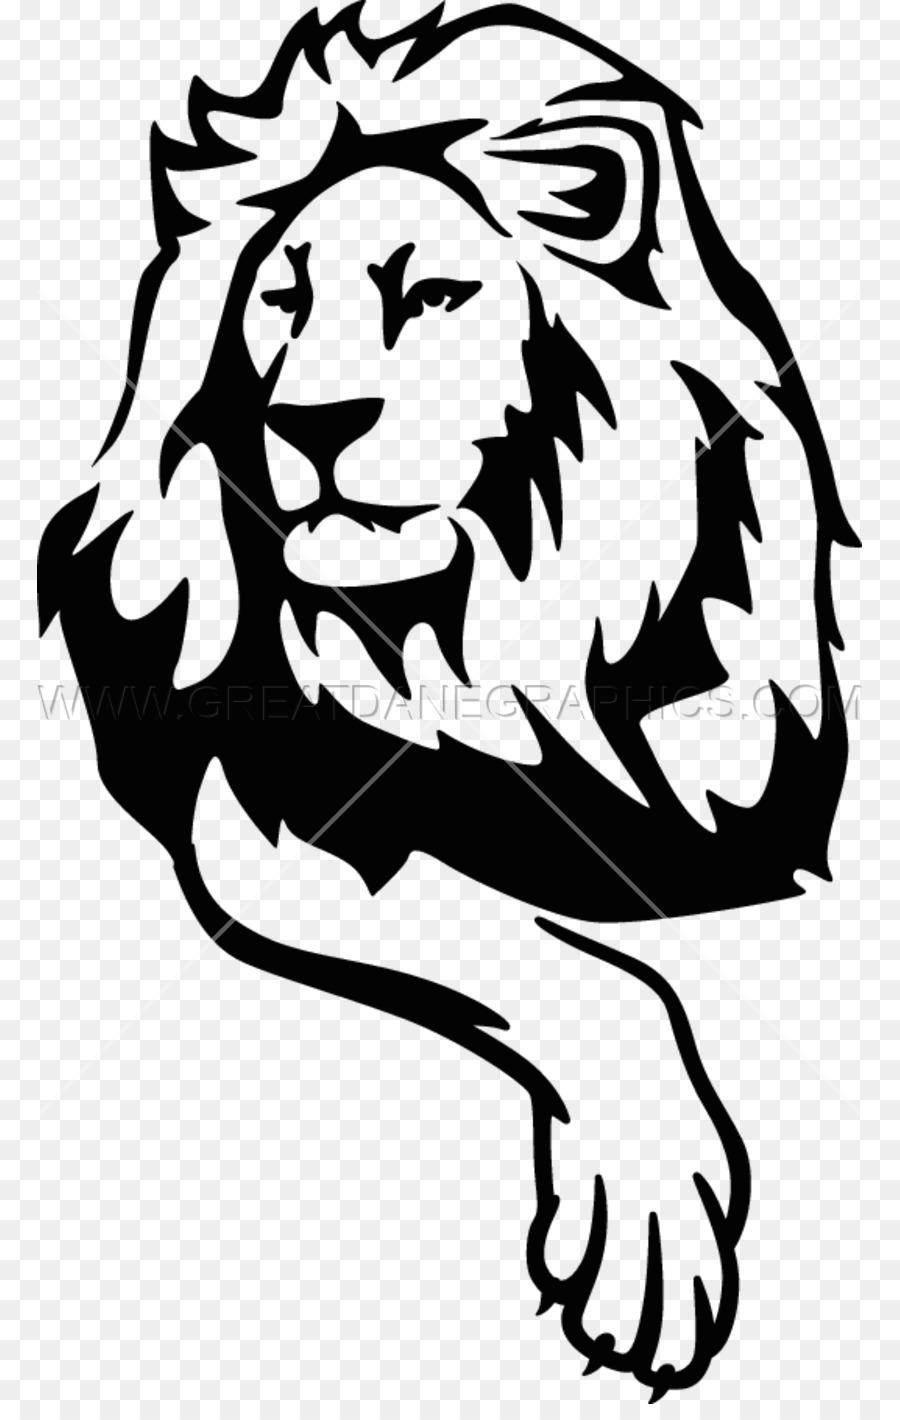 Gambar Singa Hitam Putih : gambar, singa, hitam, putih, Singa,, Hitam, Putih,, Visual, Gambar